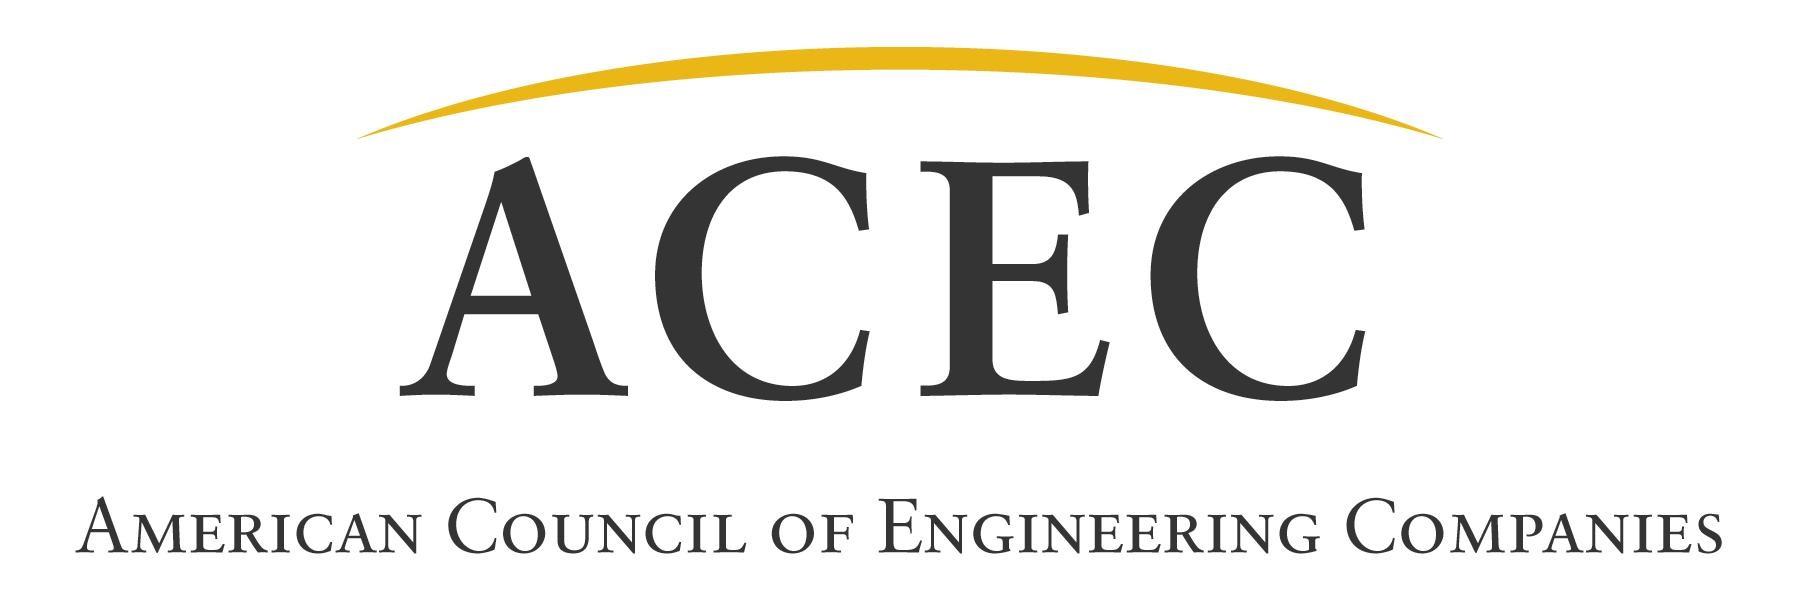 acec_logo.jpg